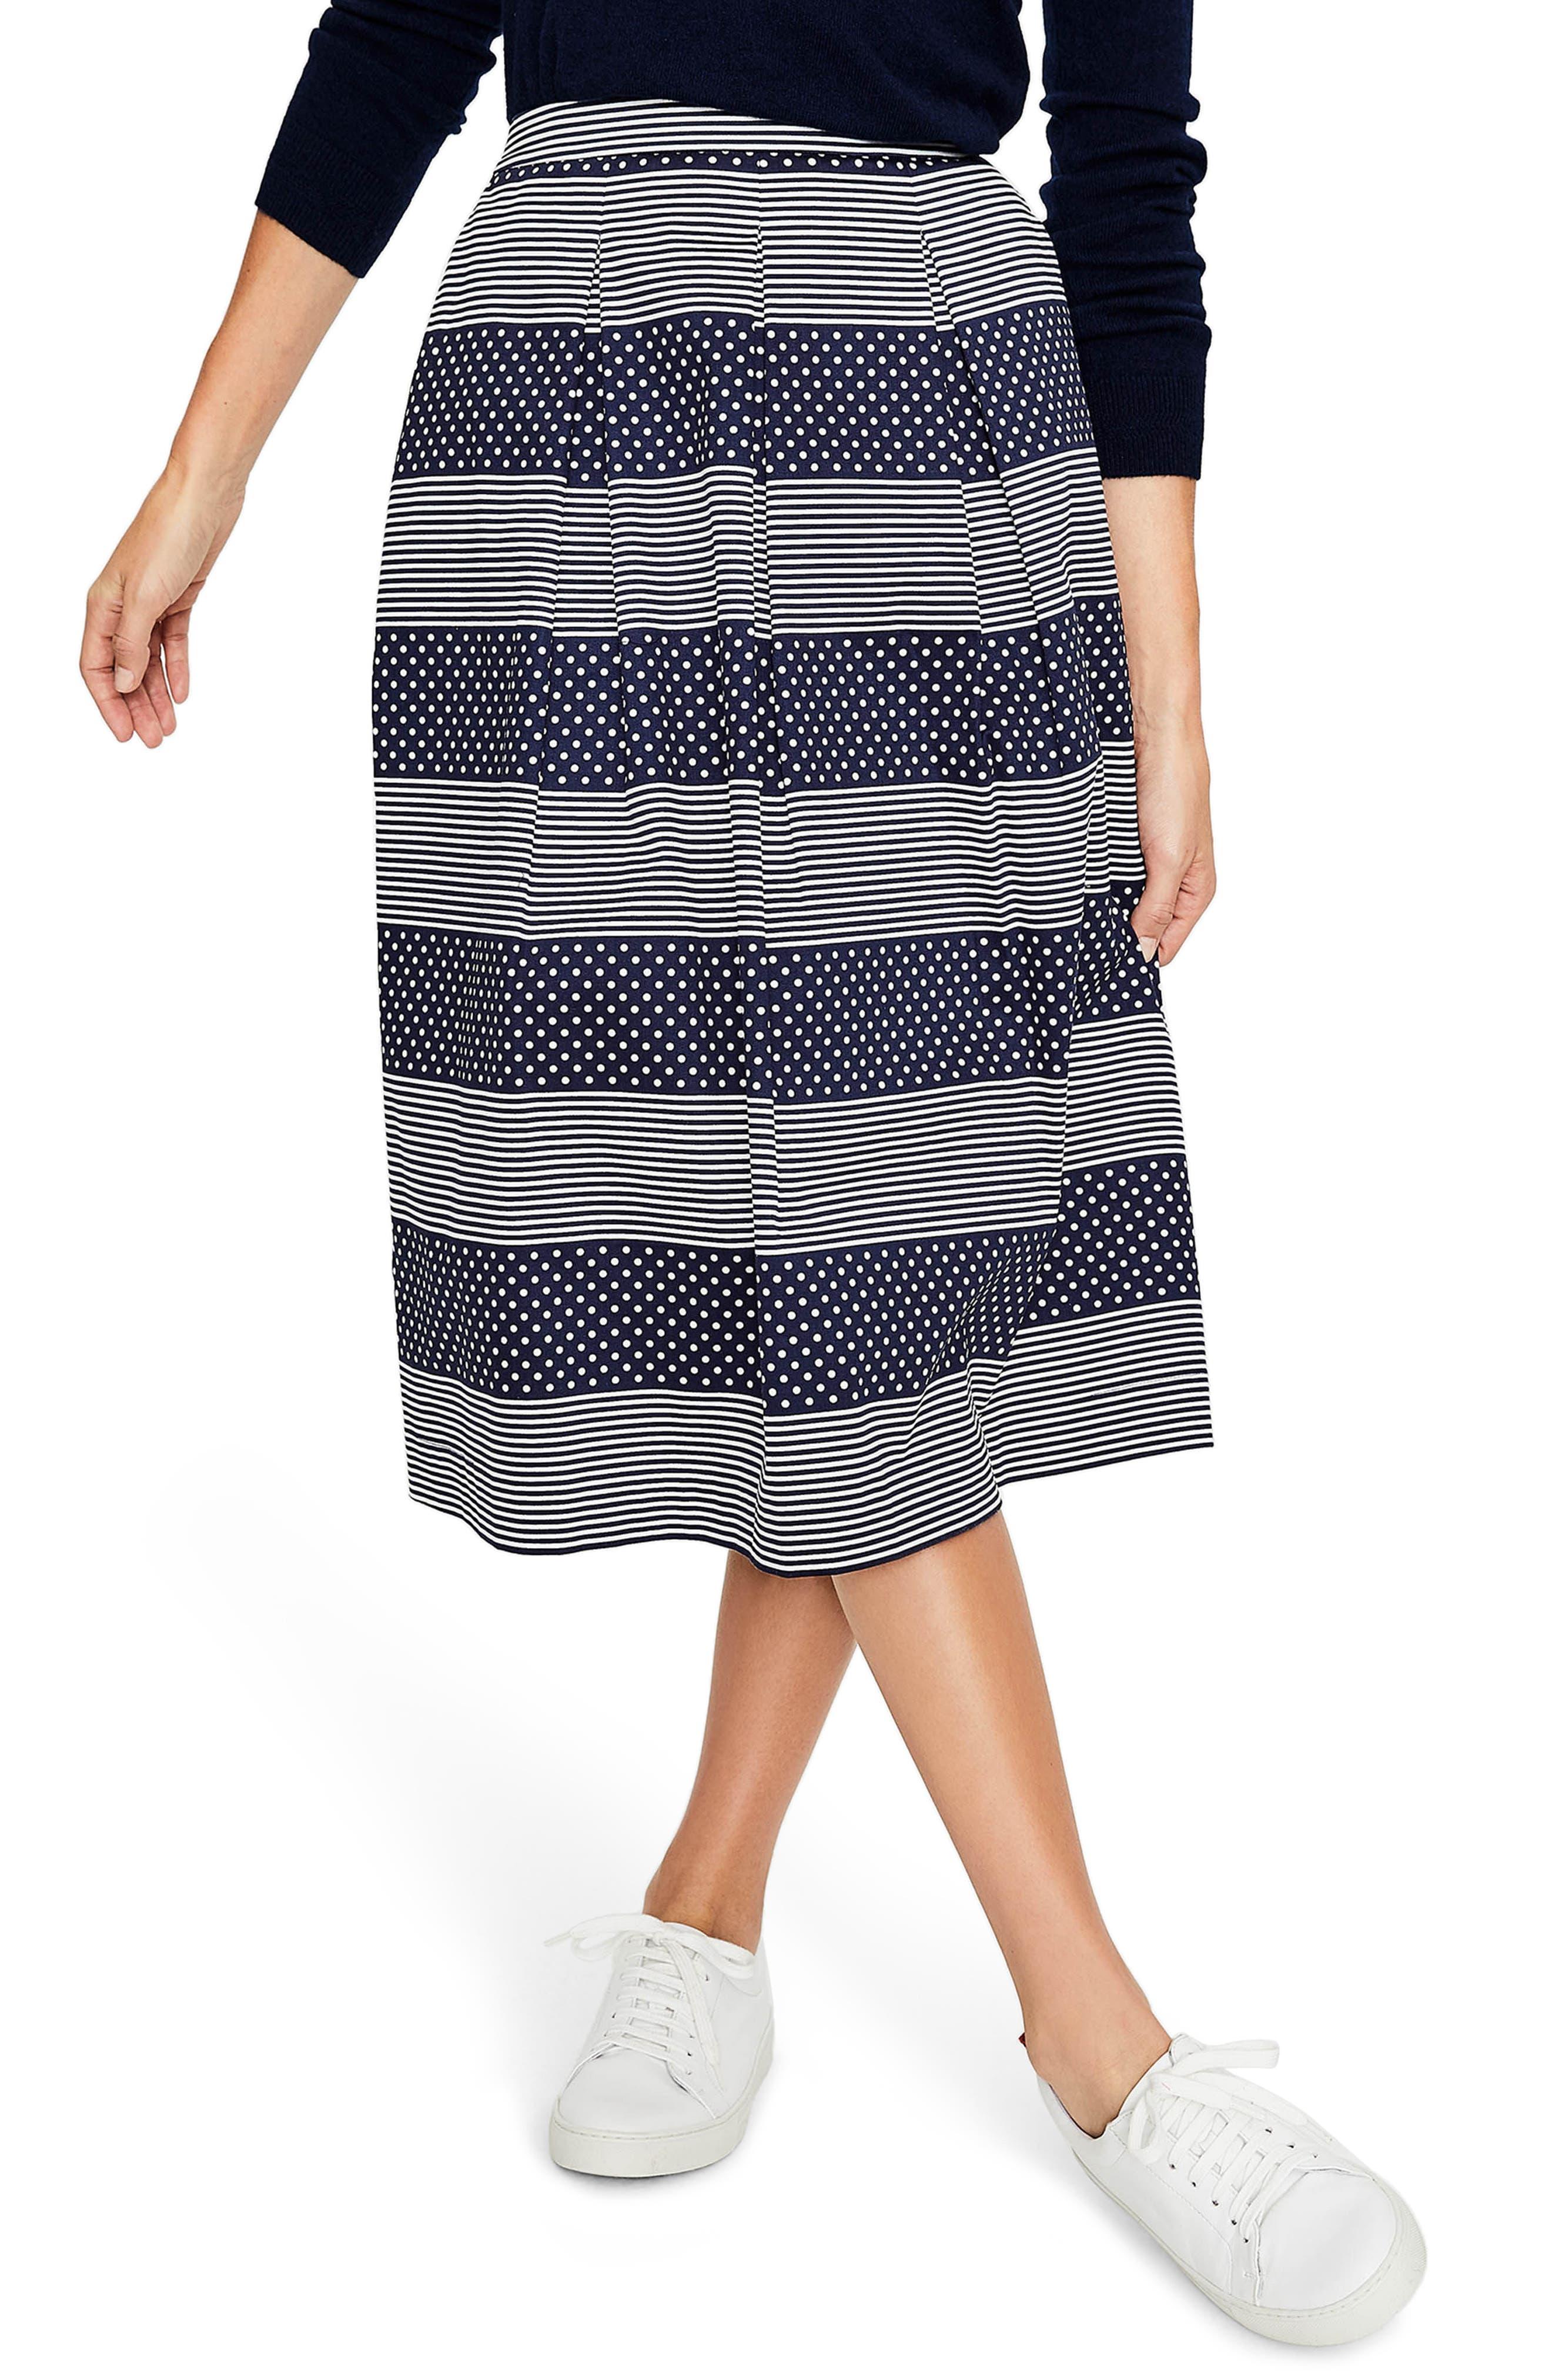 Lola Floral Flared Skirt,                         Main,                         color,